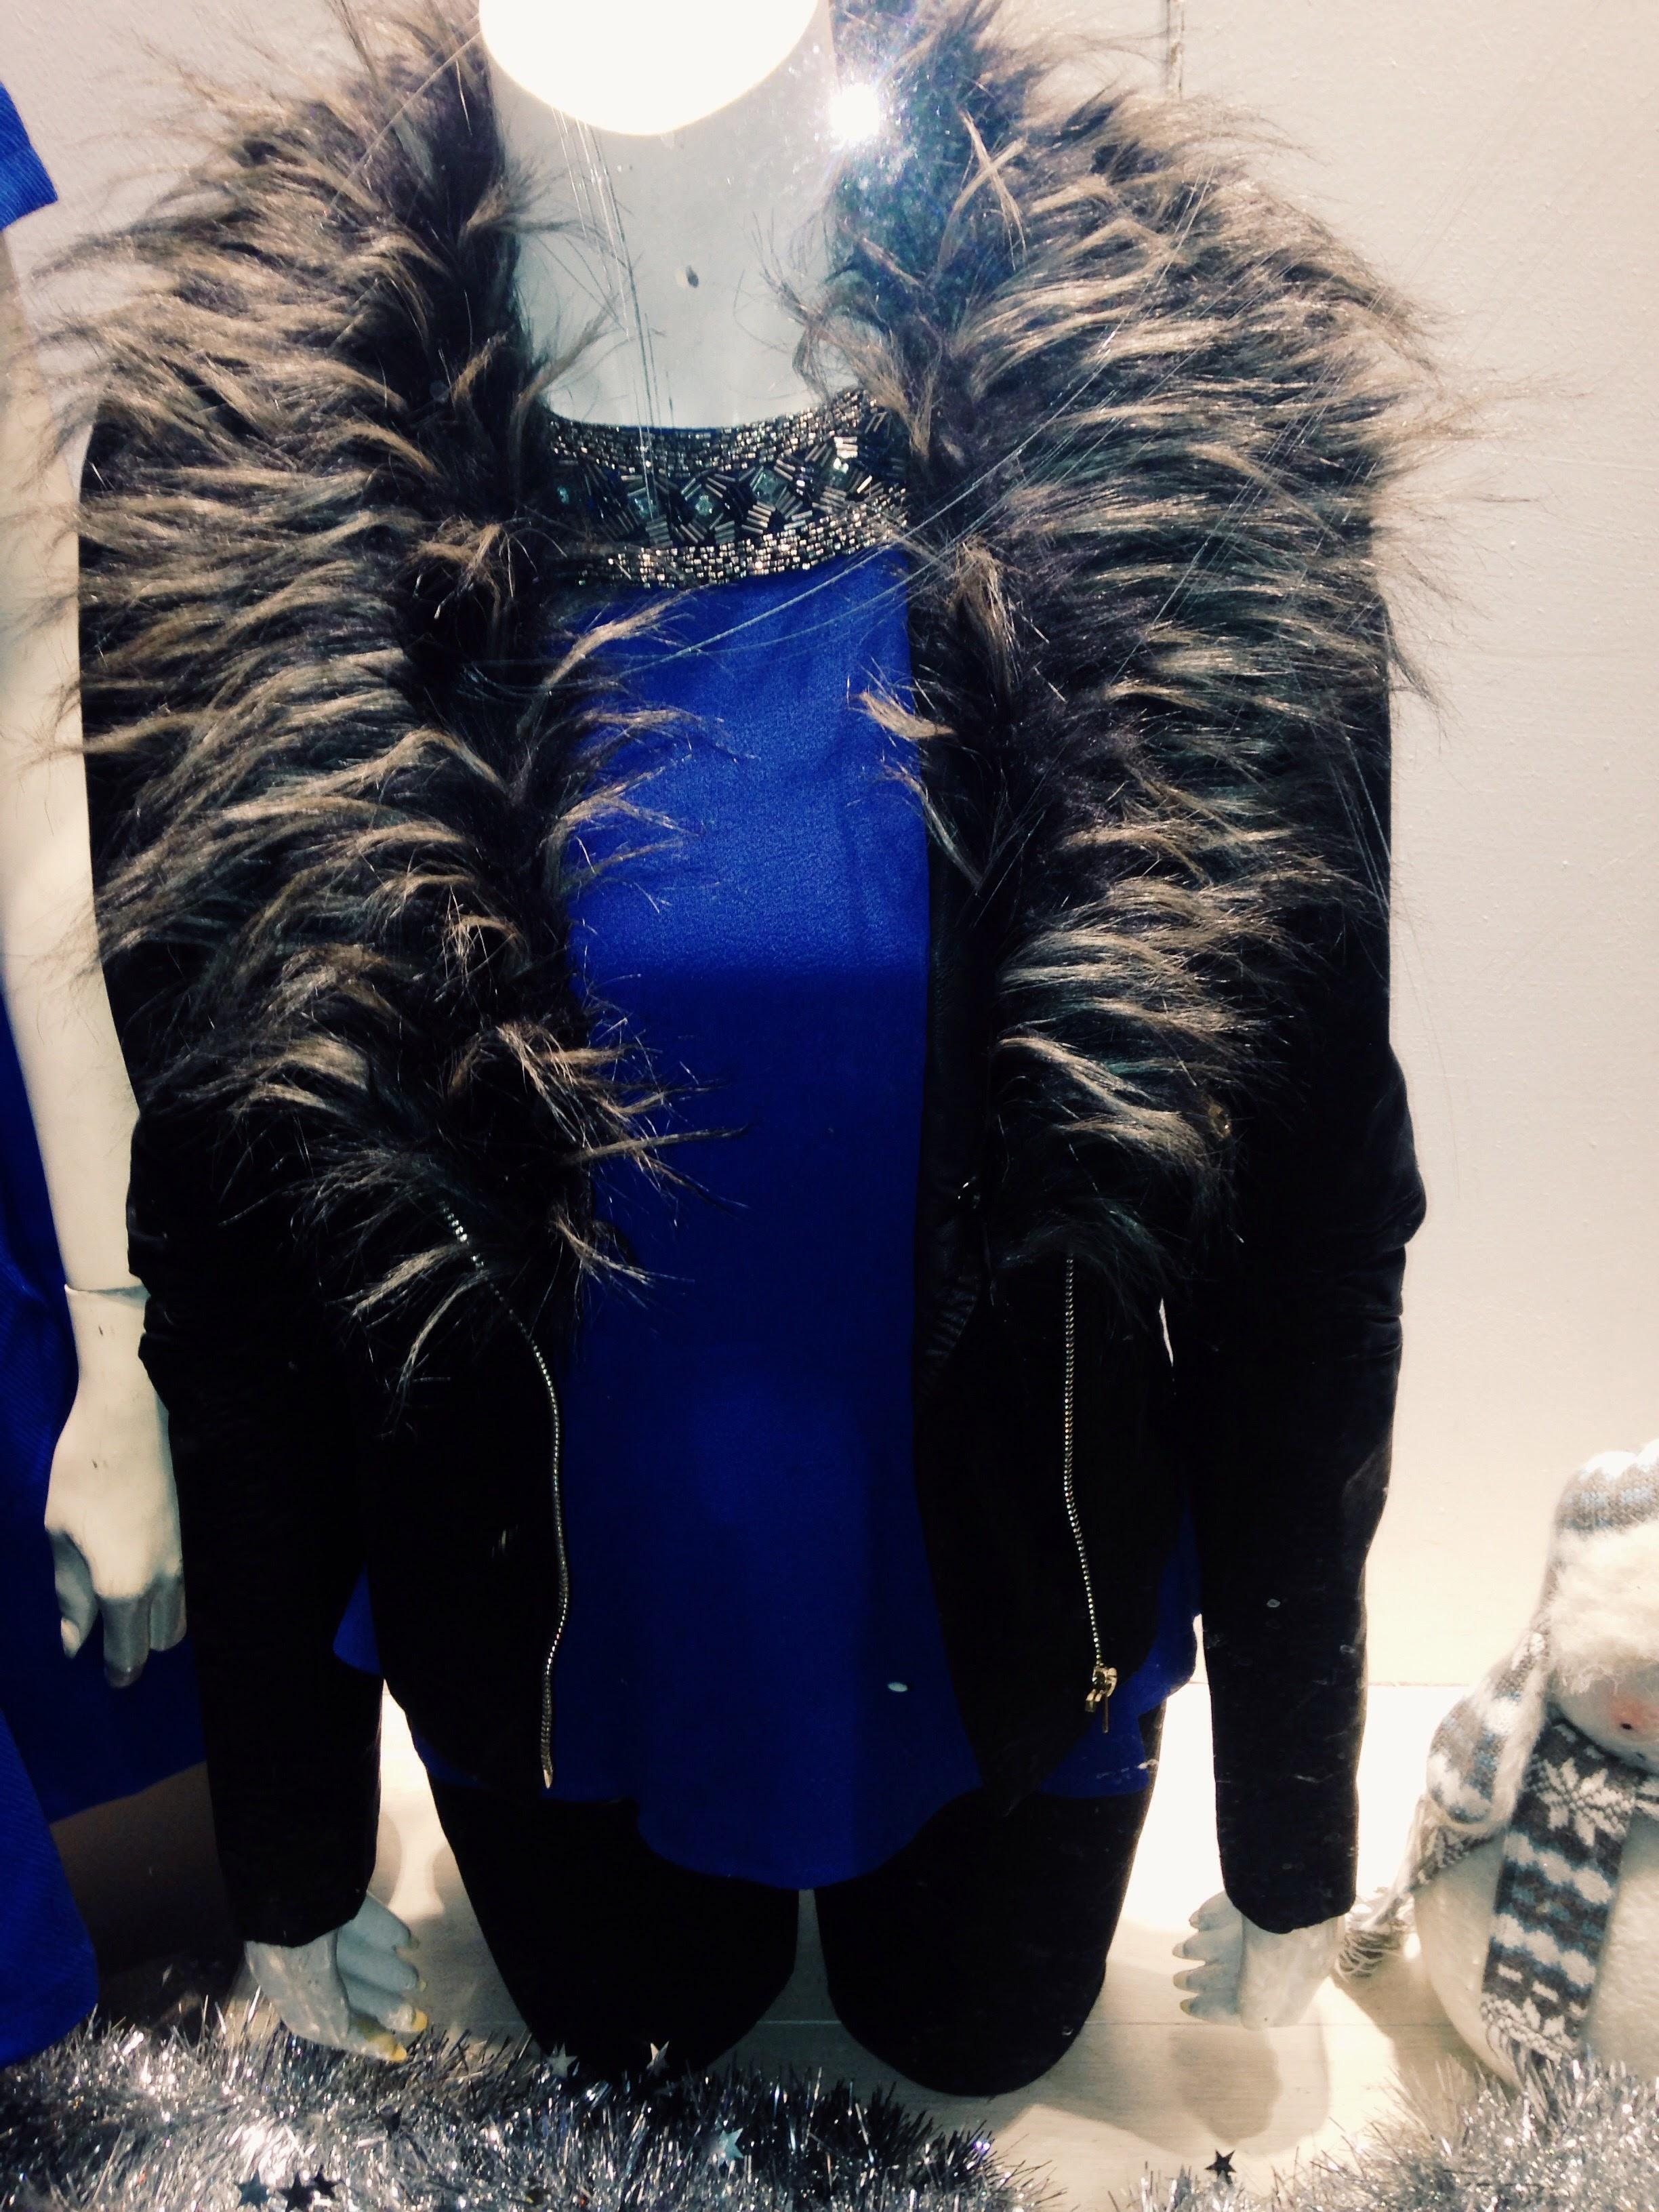 Swamp Dublin! Great Jacket with electric blue body con dress worn underneath. Dress €49.99 Jacket €65.00